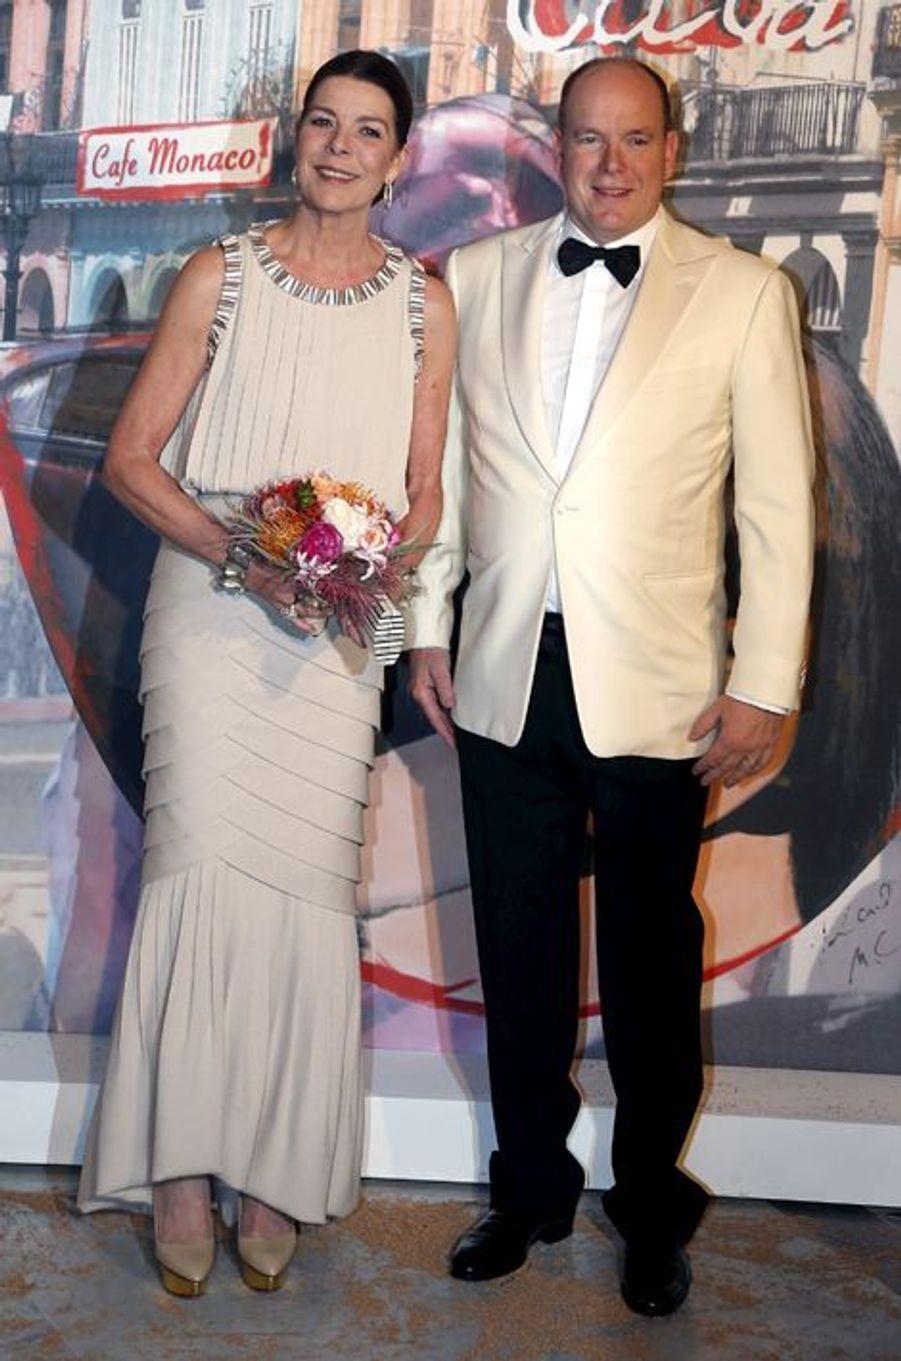 La princesse Caroline de Monaco au bal de la Rose 2016, avec le prince Albert II